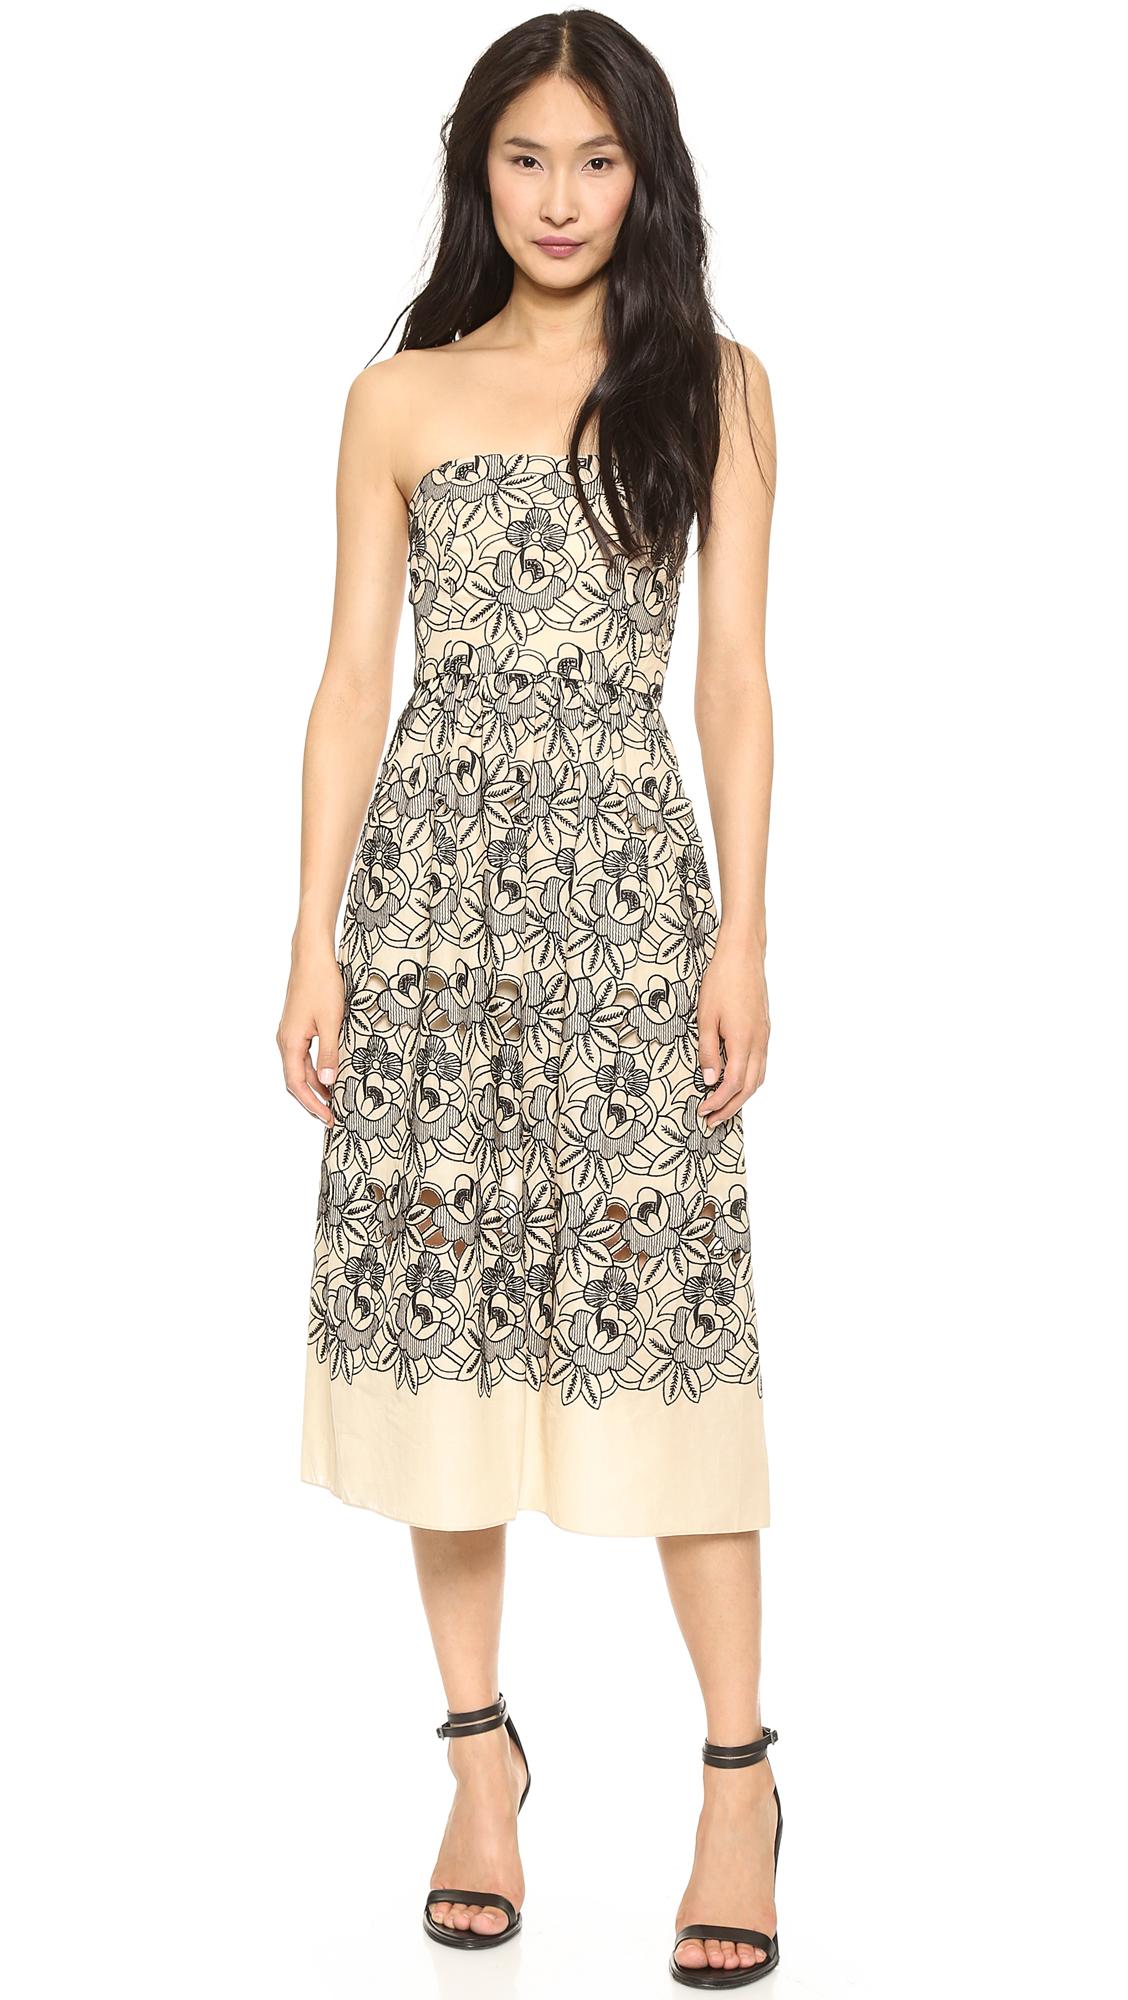 Tibi Strapless Dress - SHOPBOP